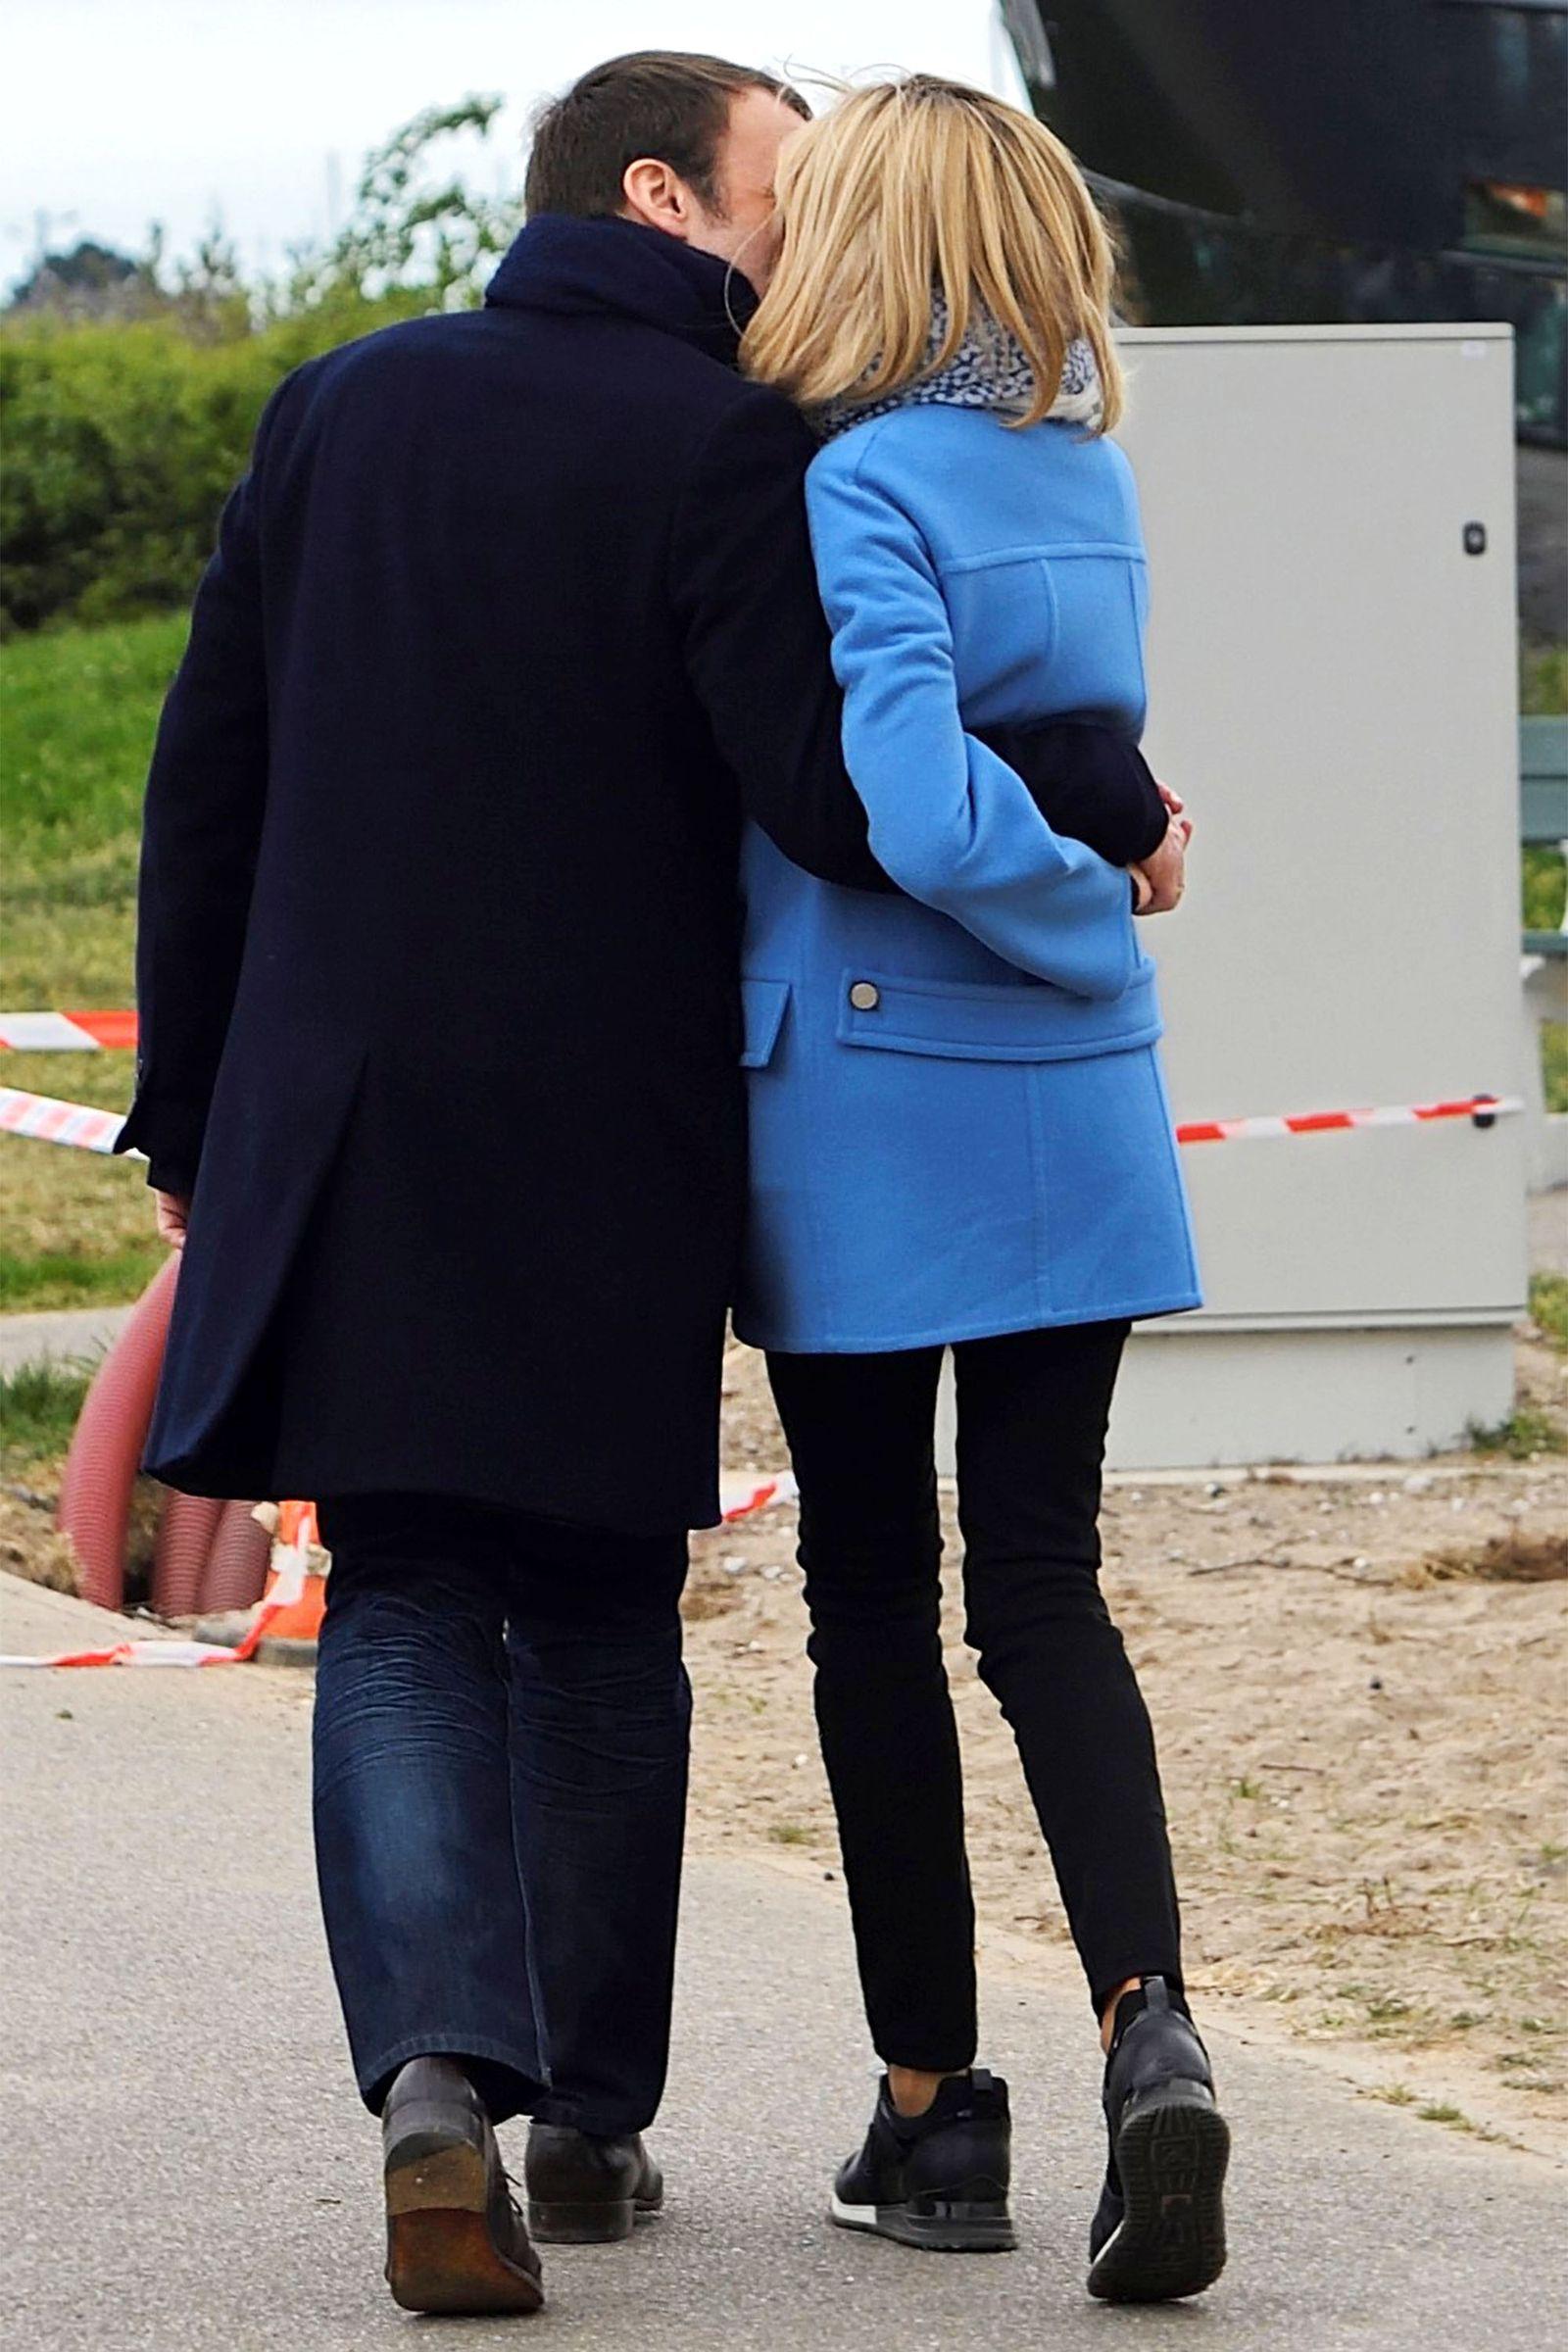 Resume Du Discours De Macron 14 Juin